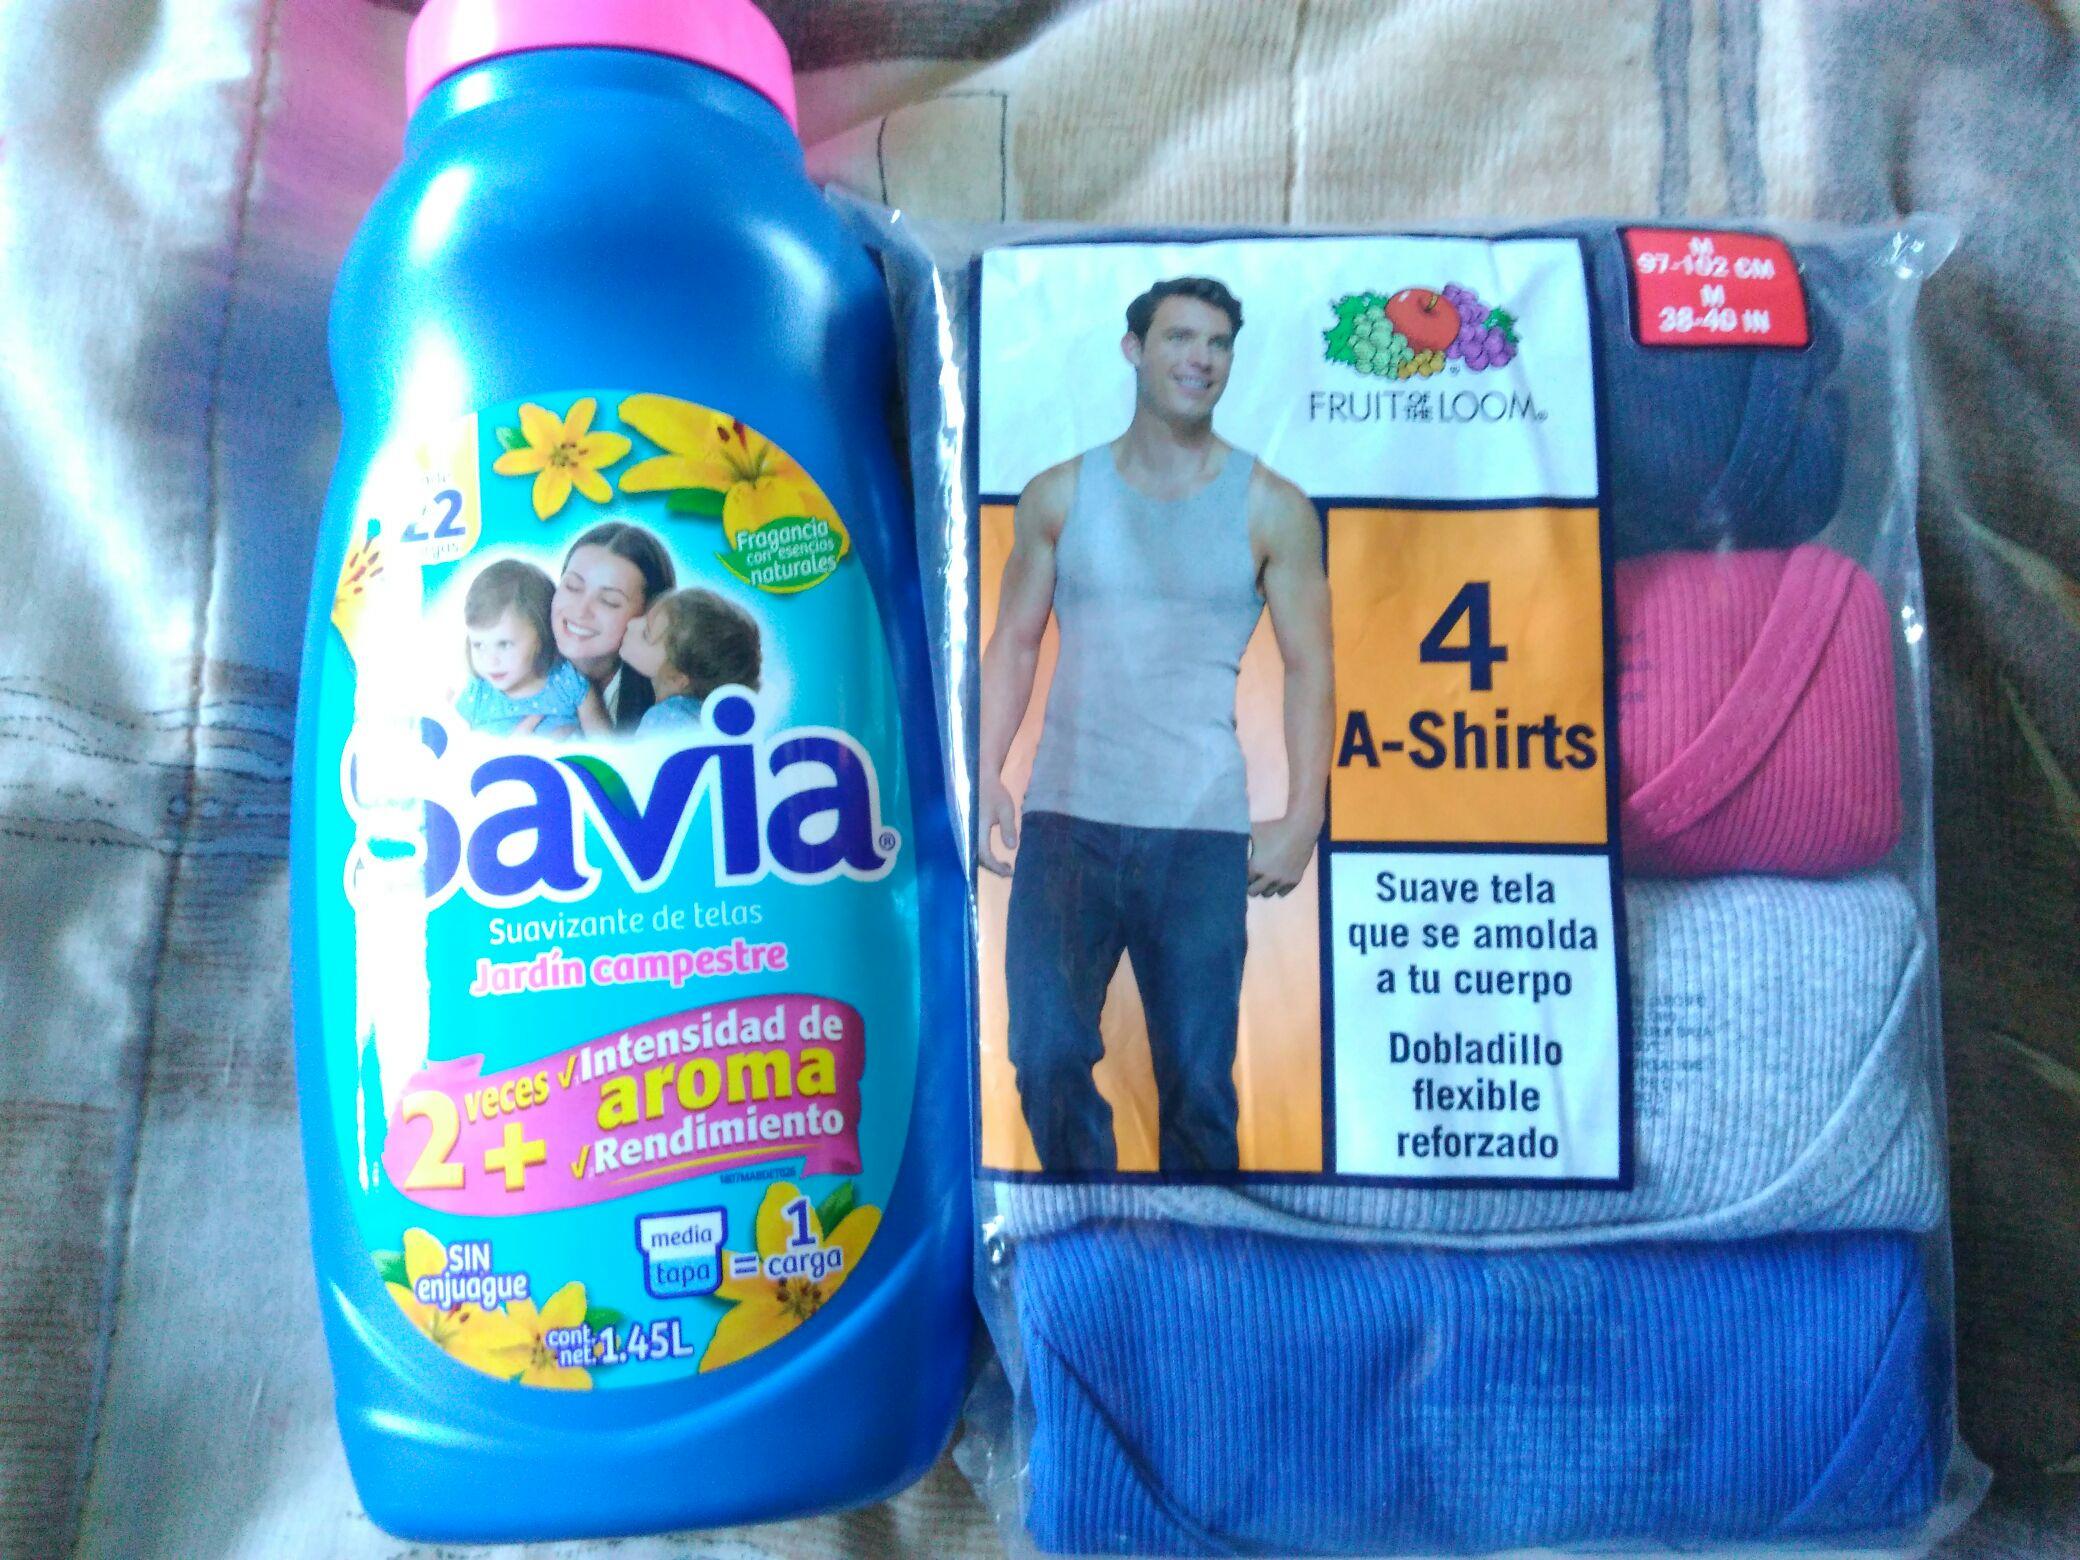 Bodega Aurrera: savia 1.45 lts. Y camisetas